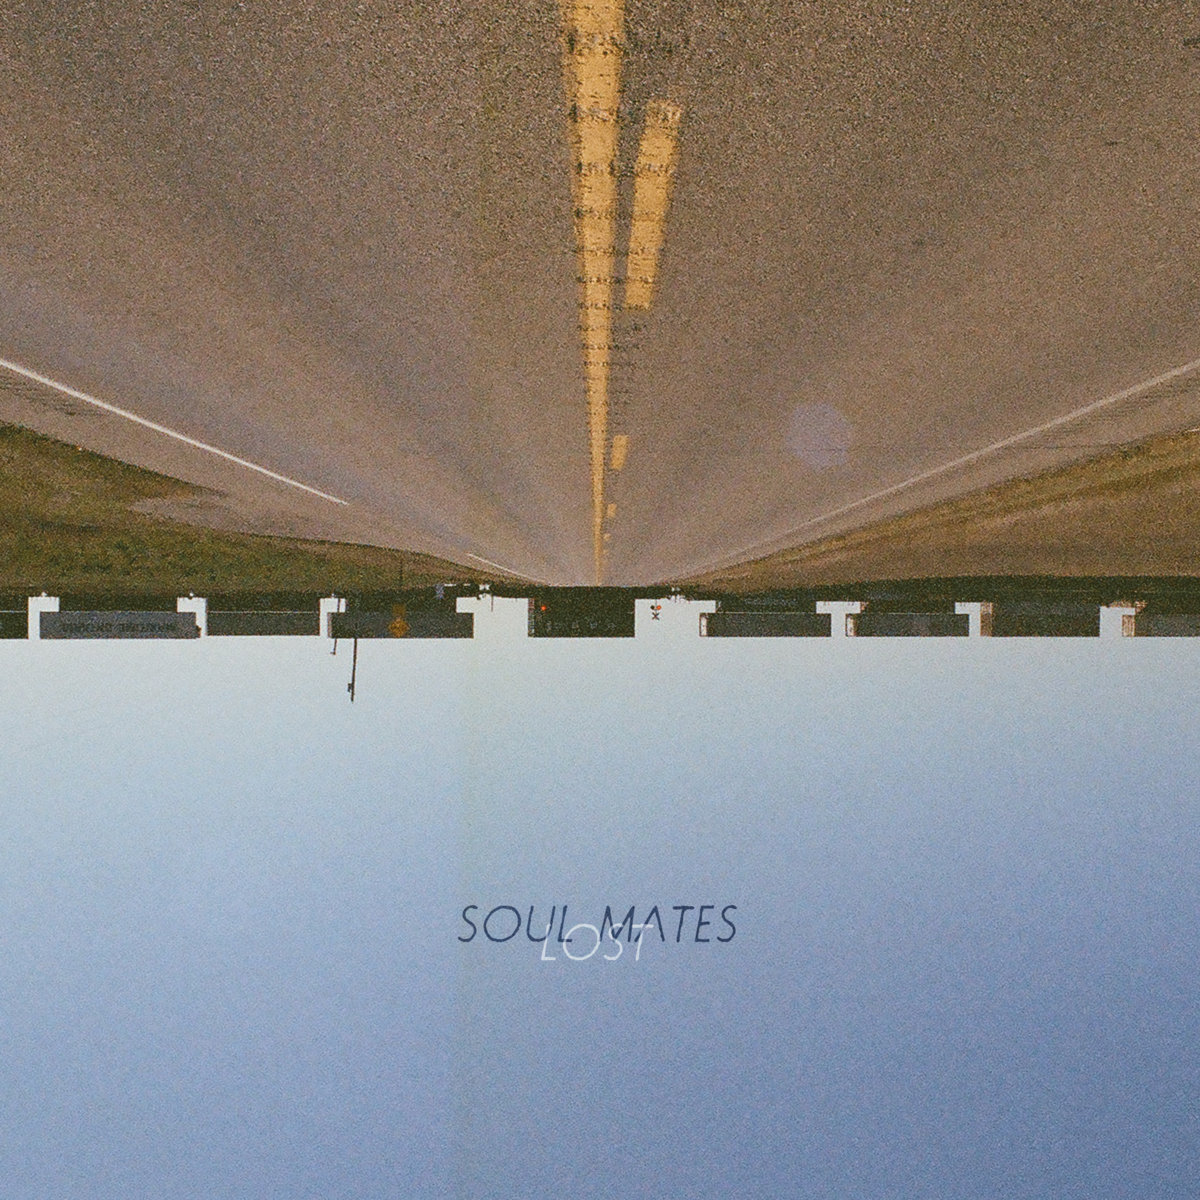 Soul Mates - Lost  Artwork by Tyler Baptist